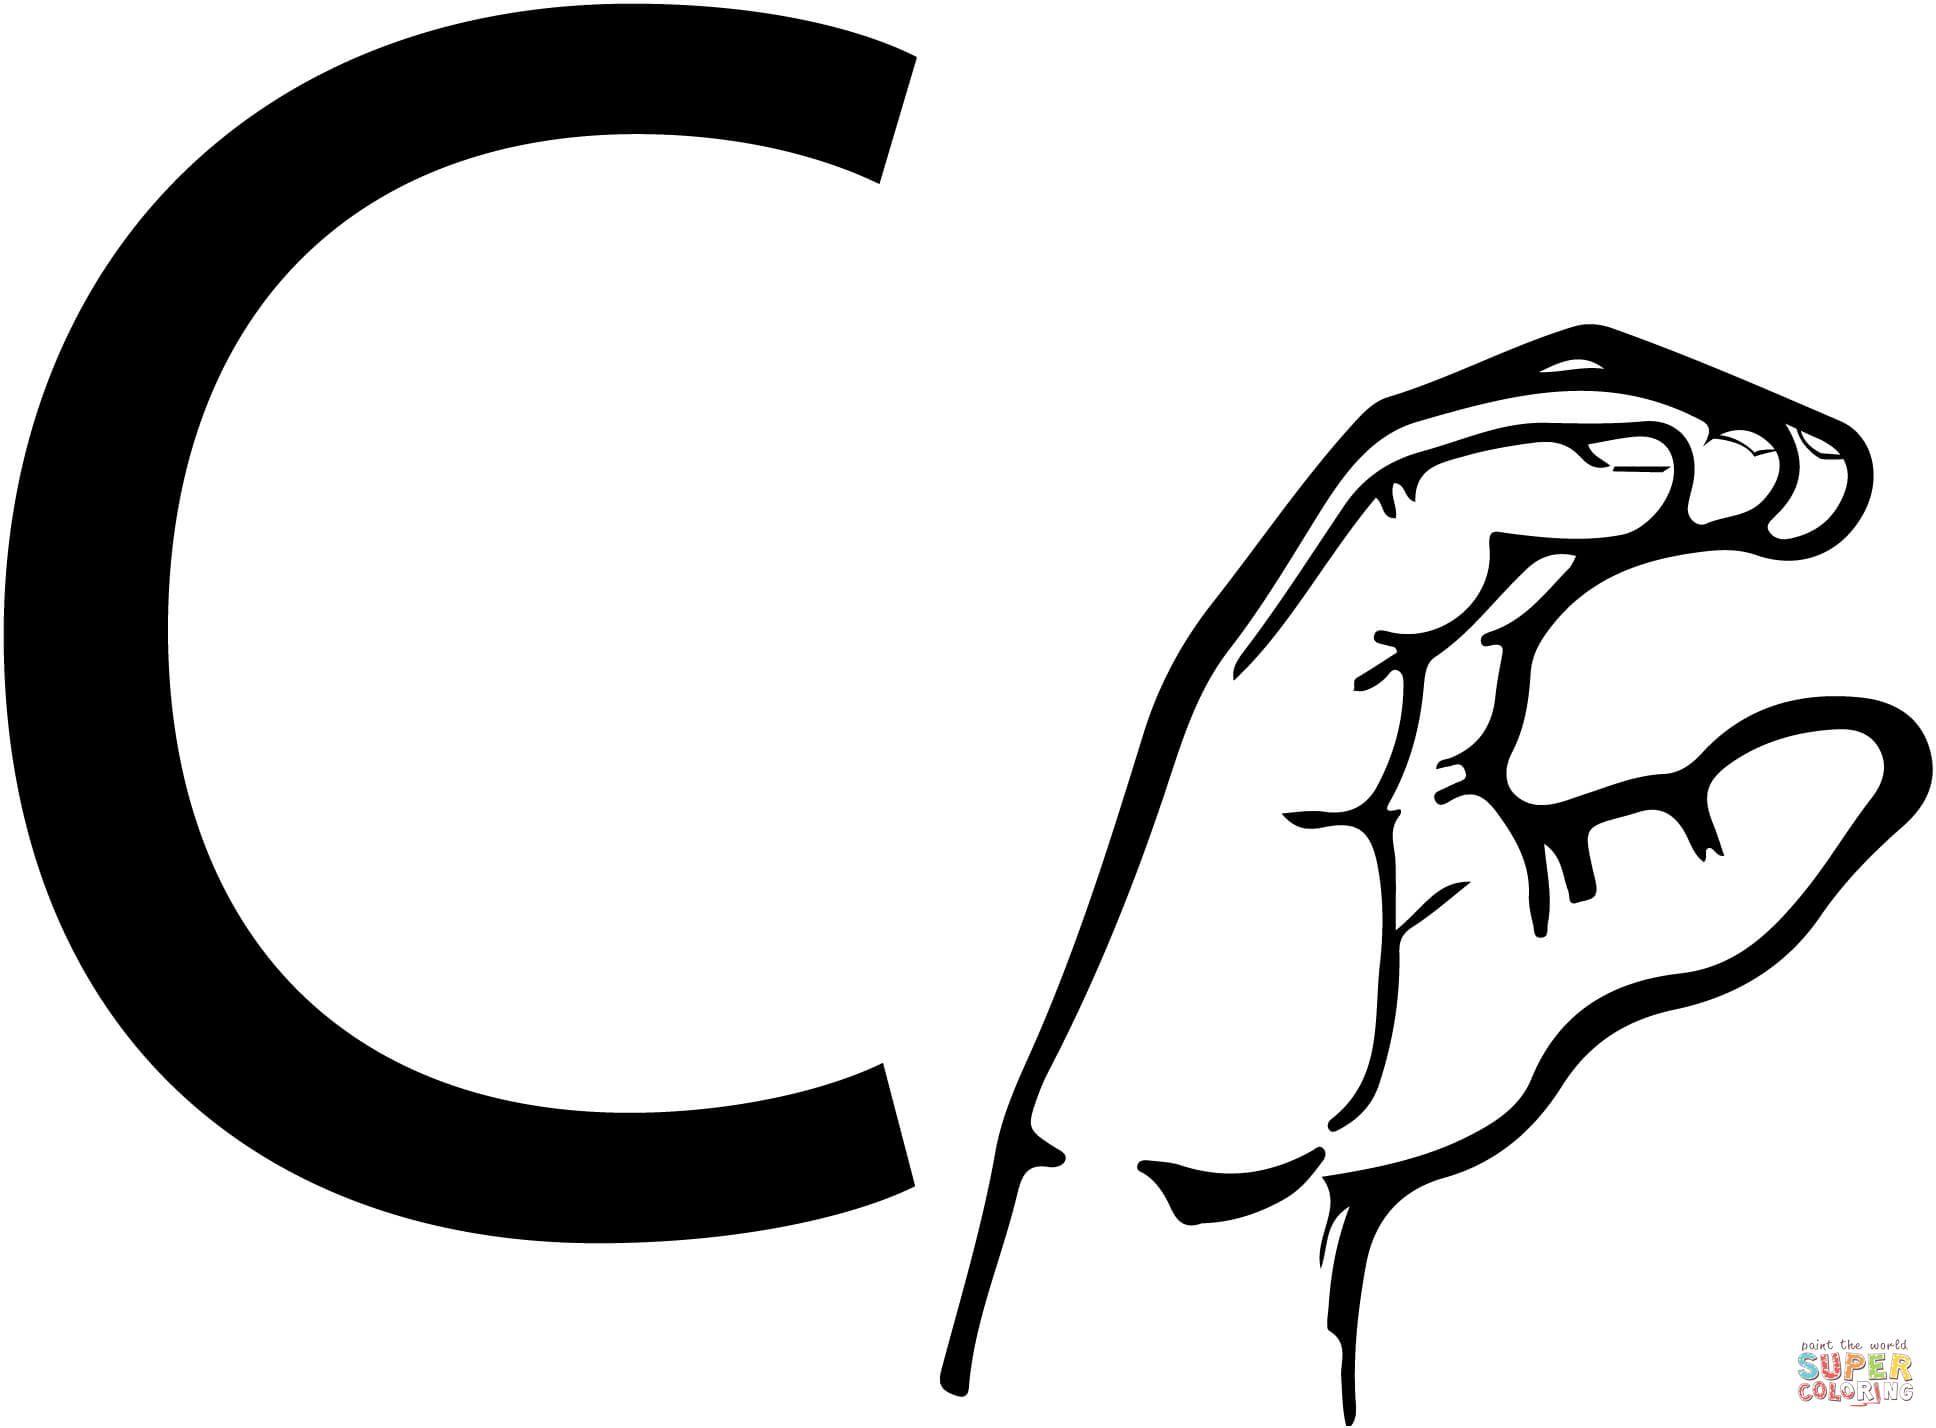 Asl Sign Language Letter C Coloring Page